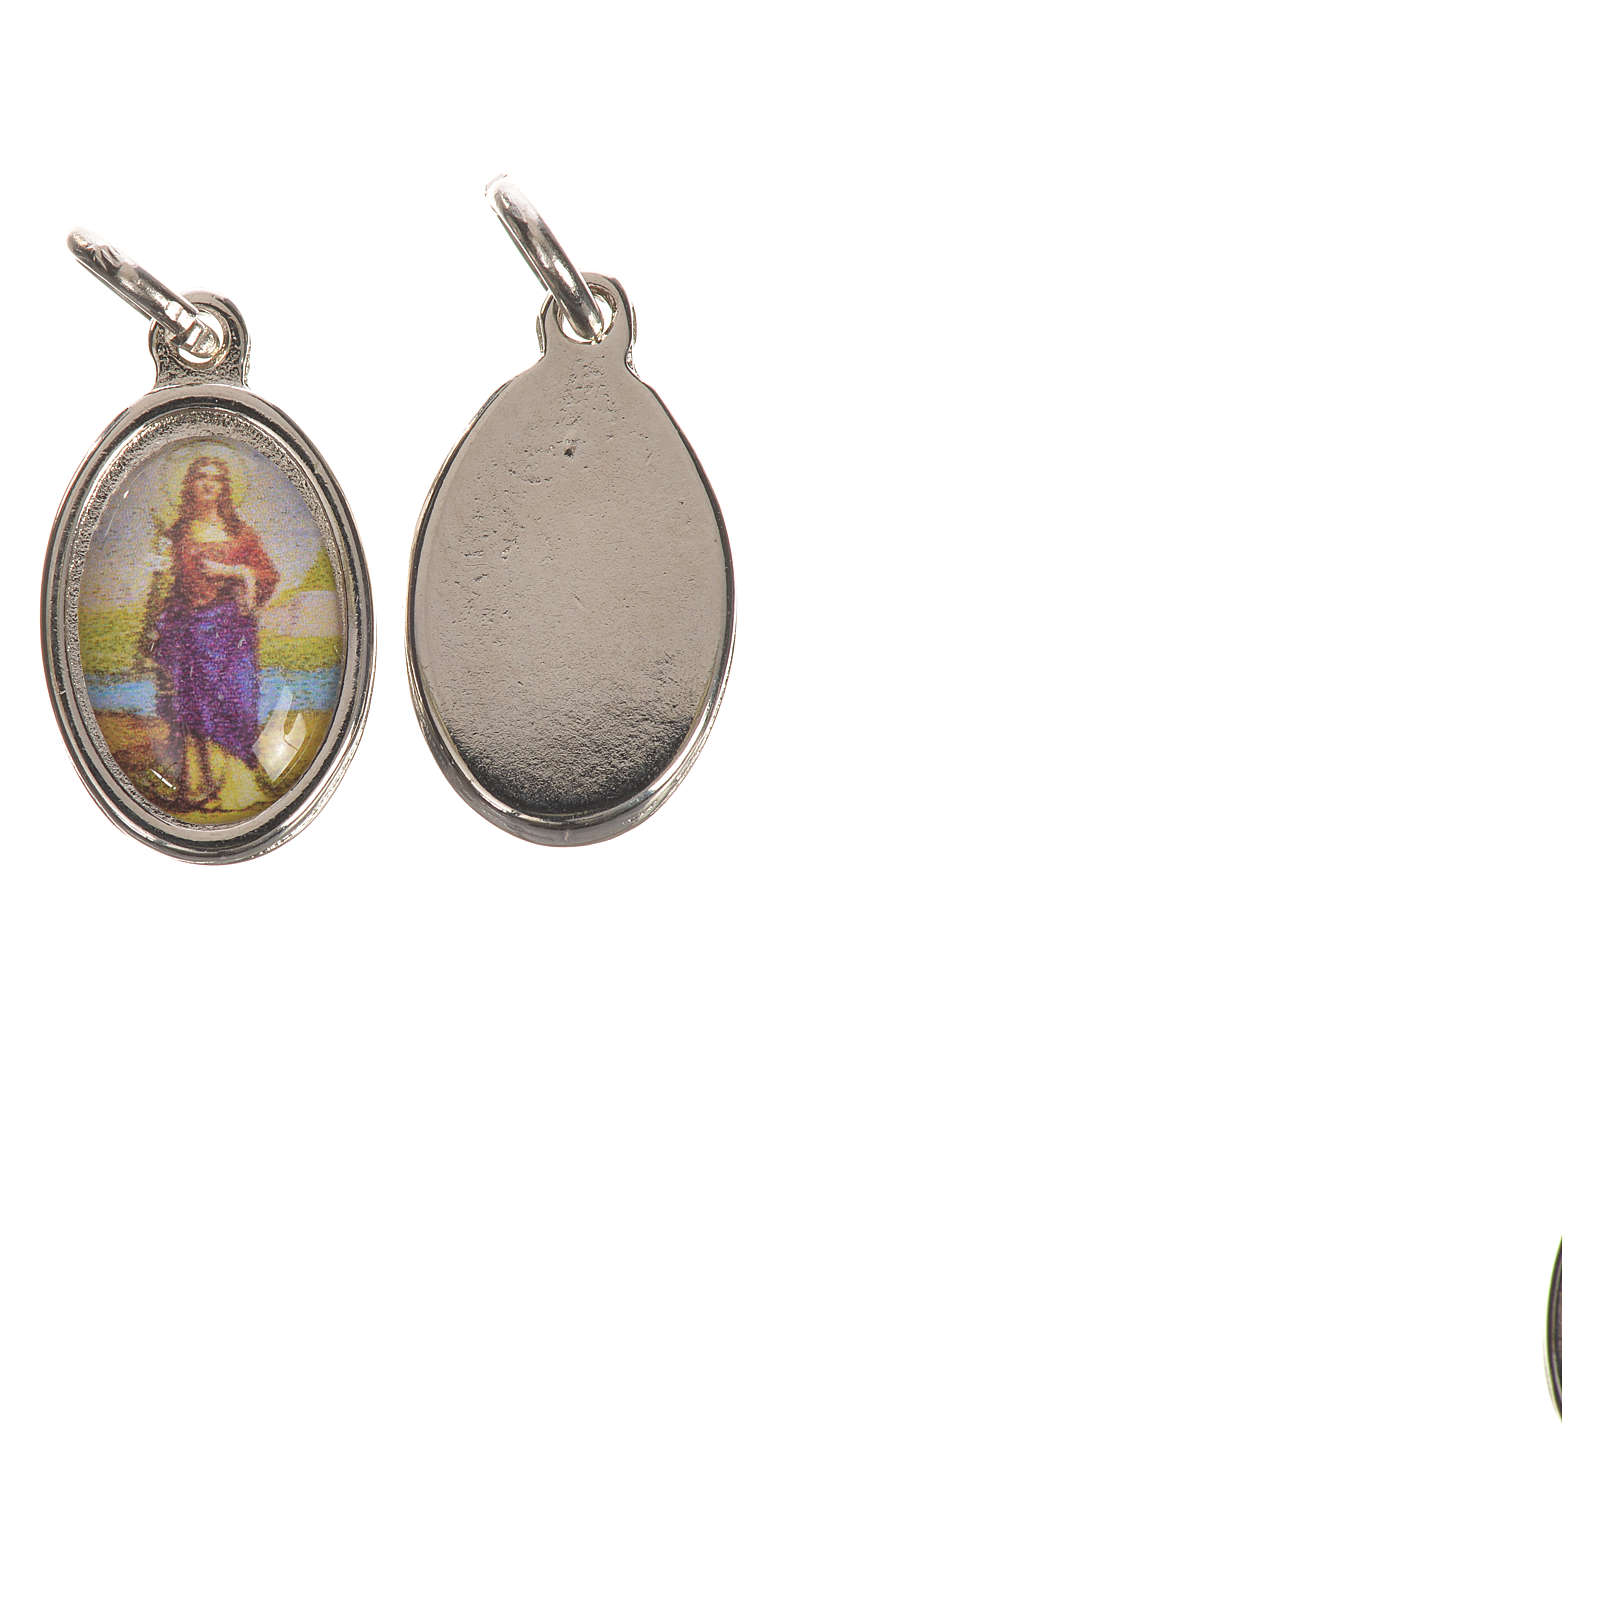 Medaille Heilige Philomena Silbermetall 1,5cm groß 4